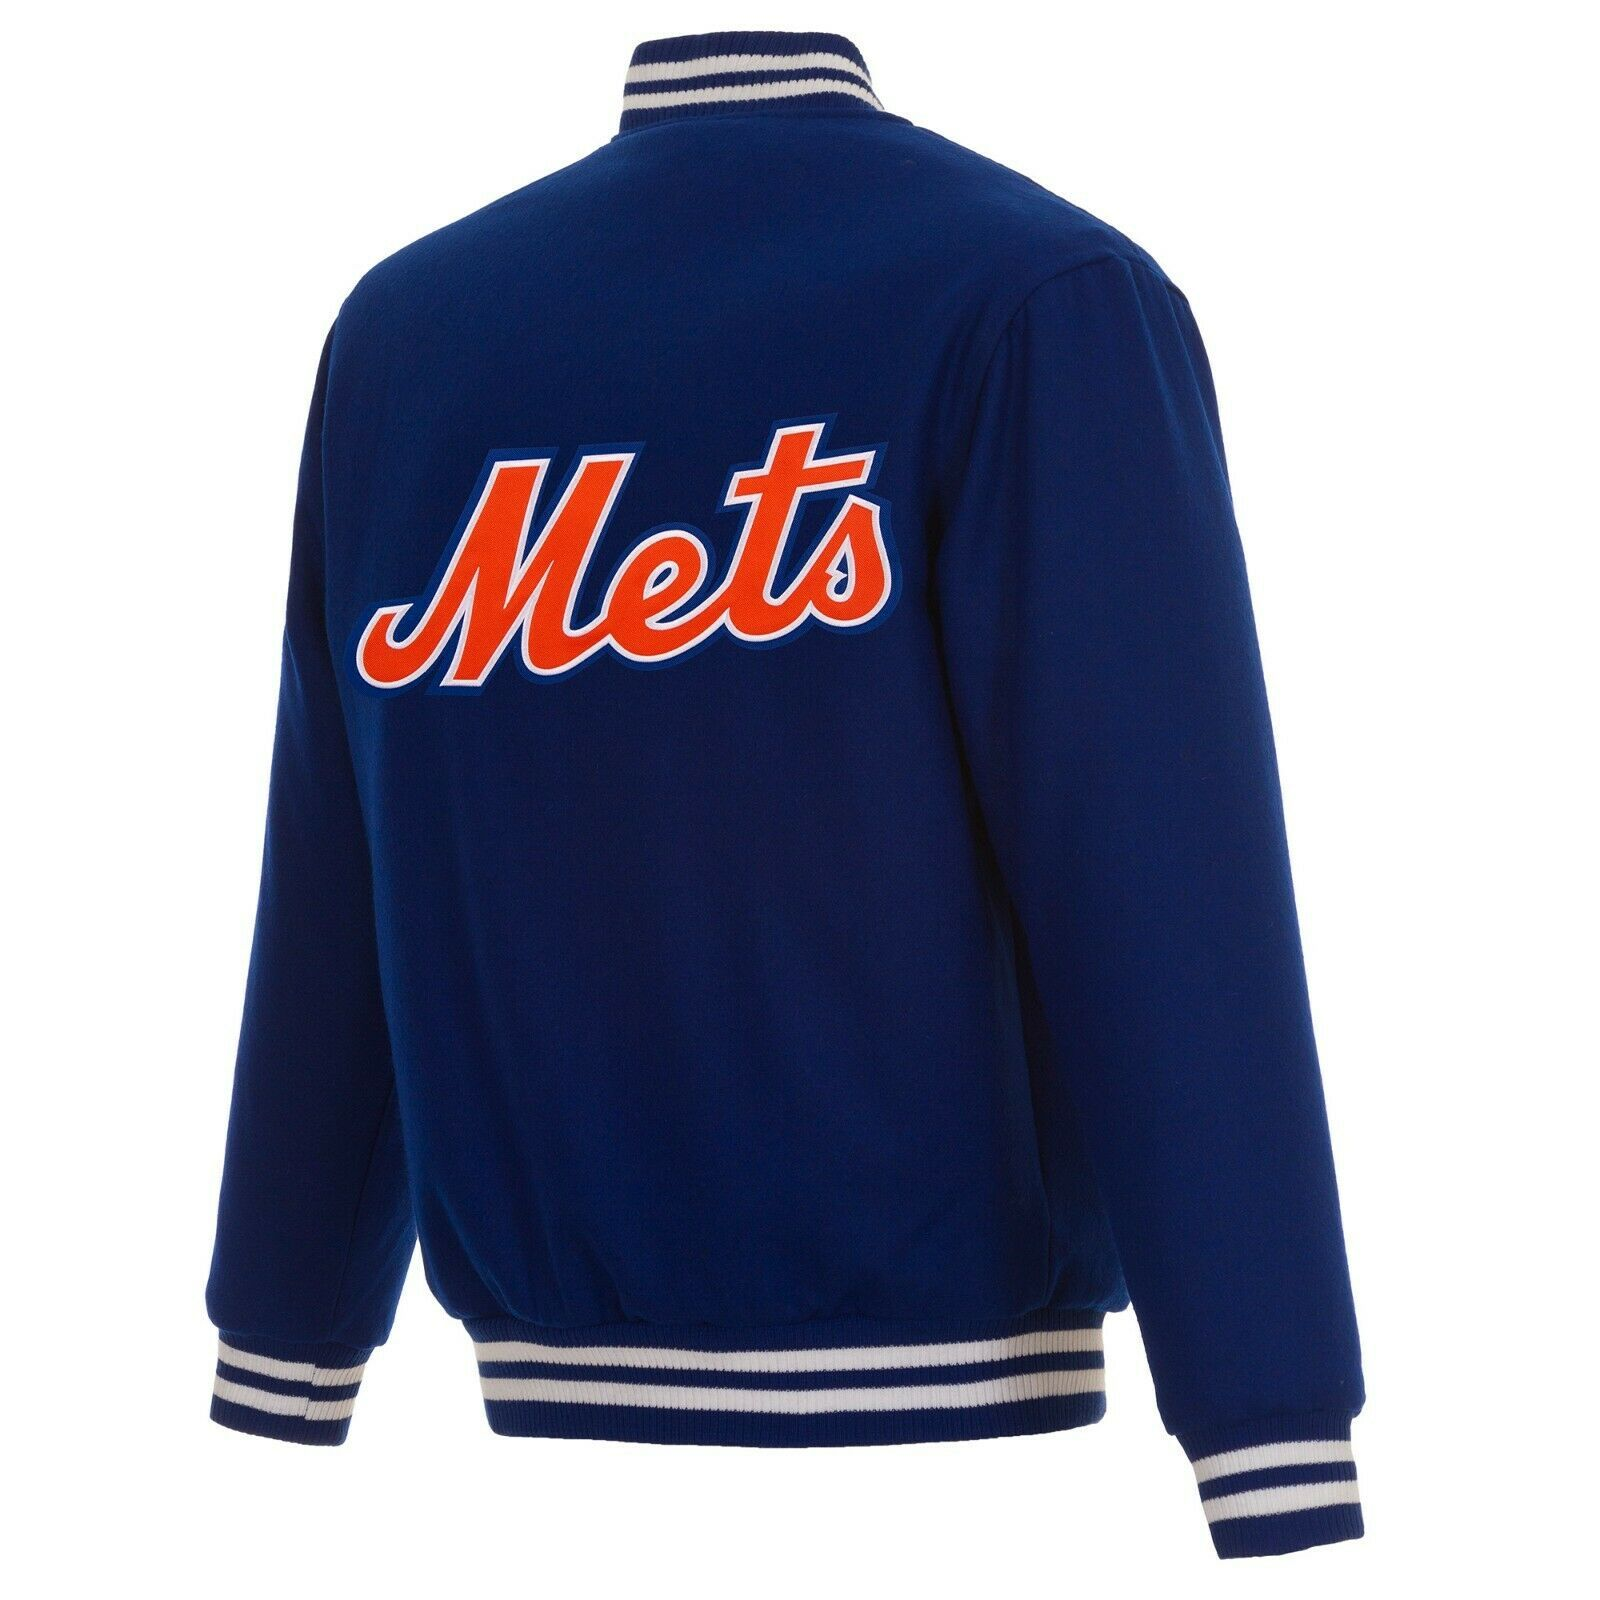 MLB New York Mets JH Design Wool Reversible Jacket Royal Blue Embroidered Logos - $179.99